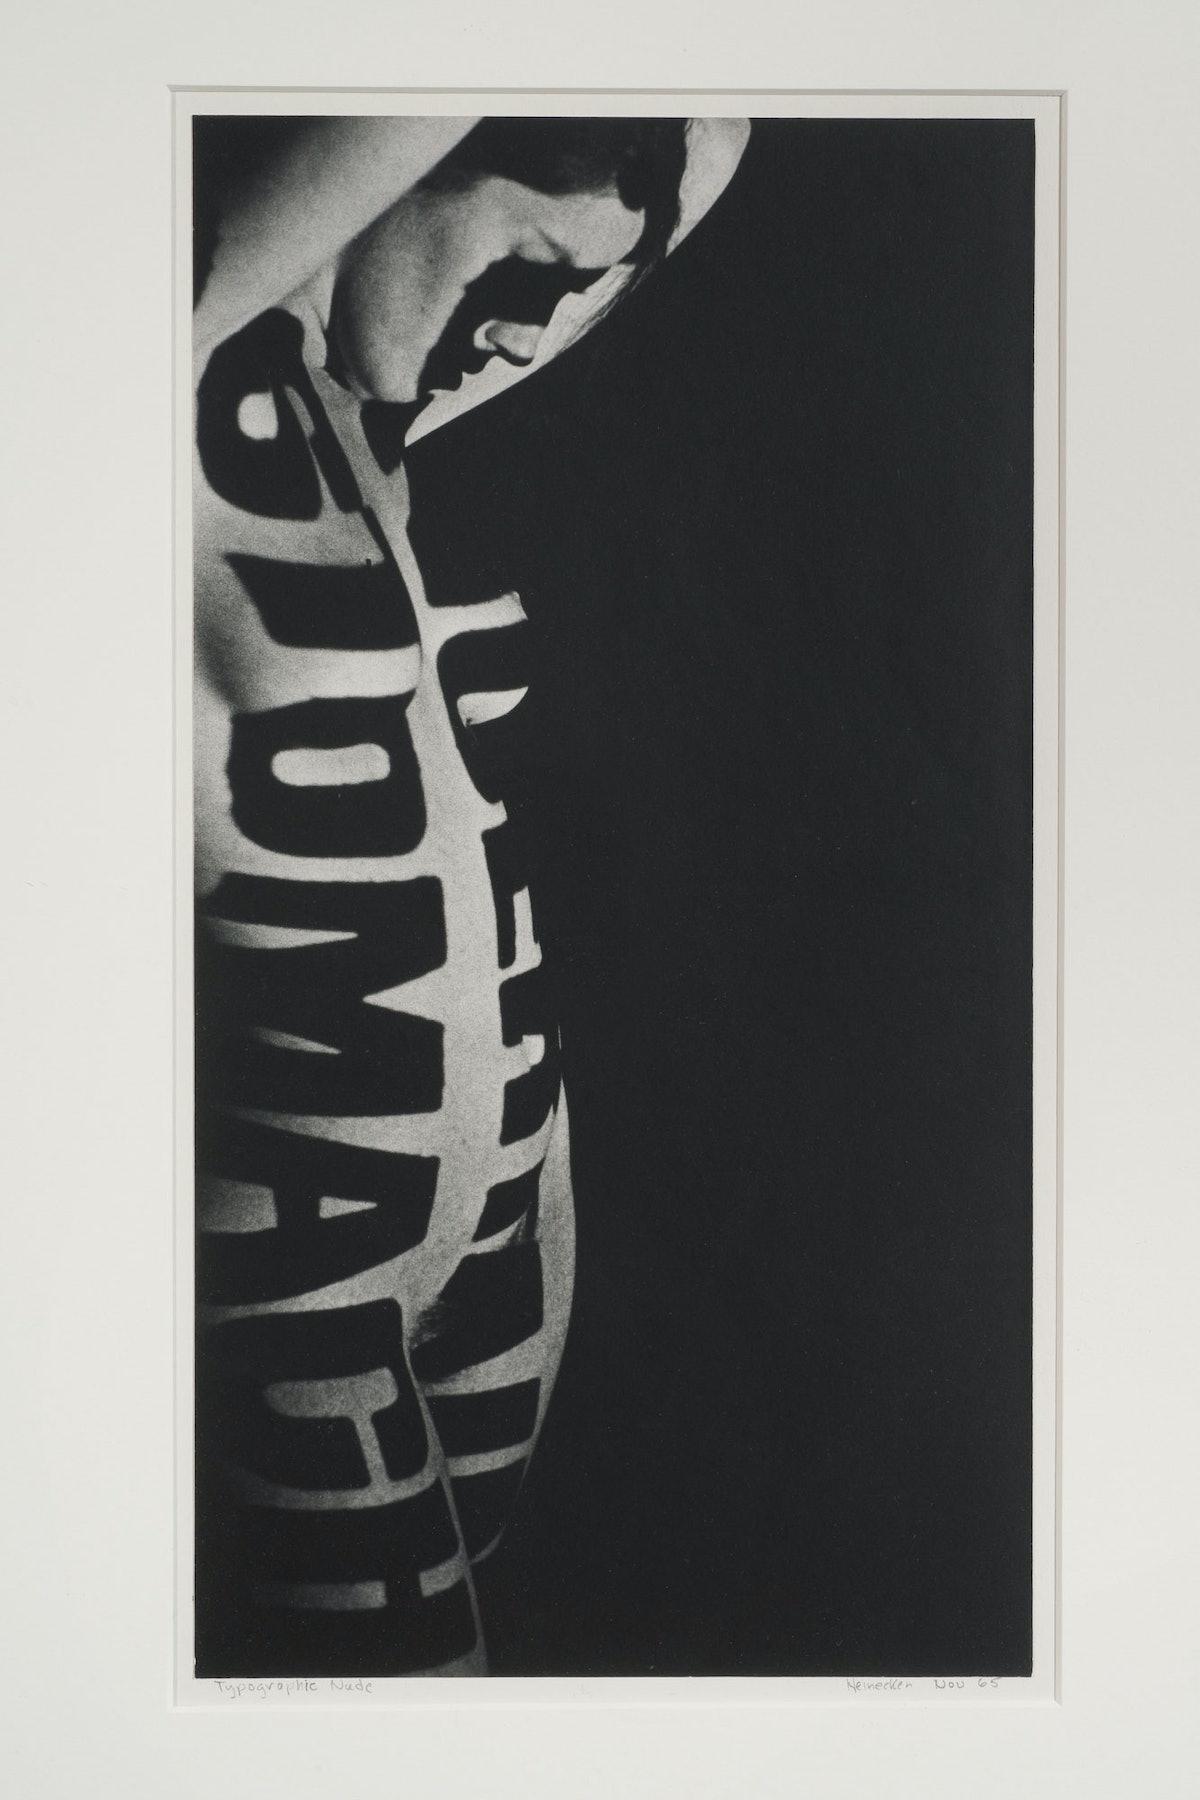 Robert Heinecken MoMA